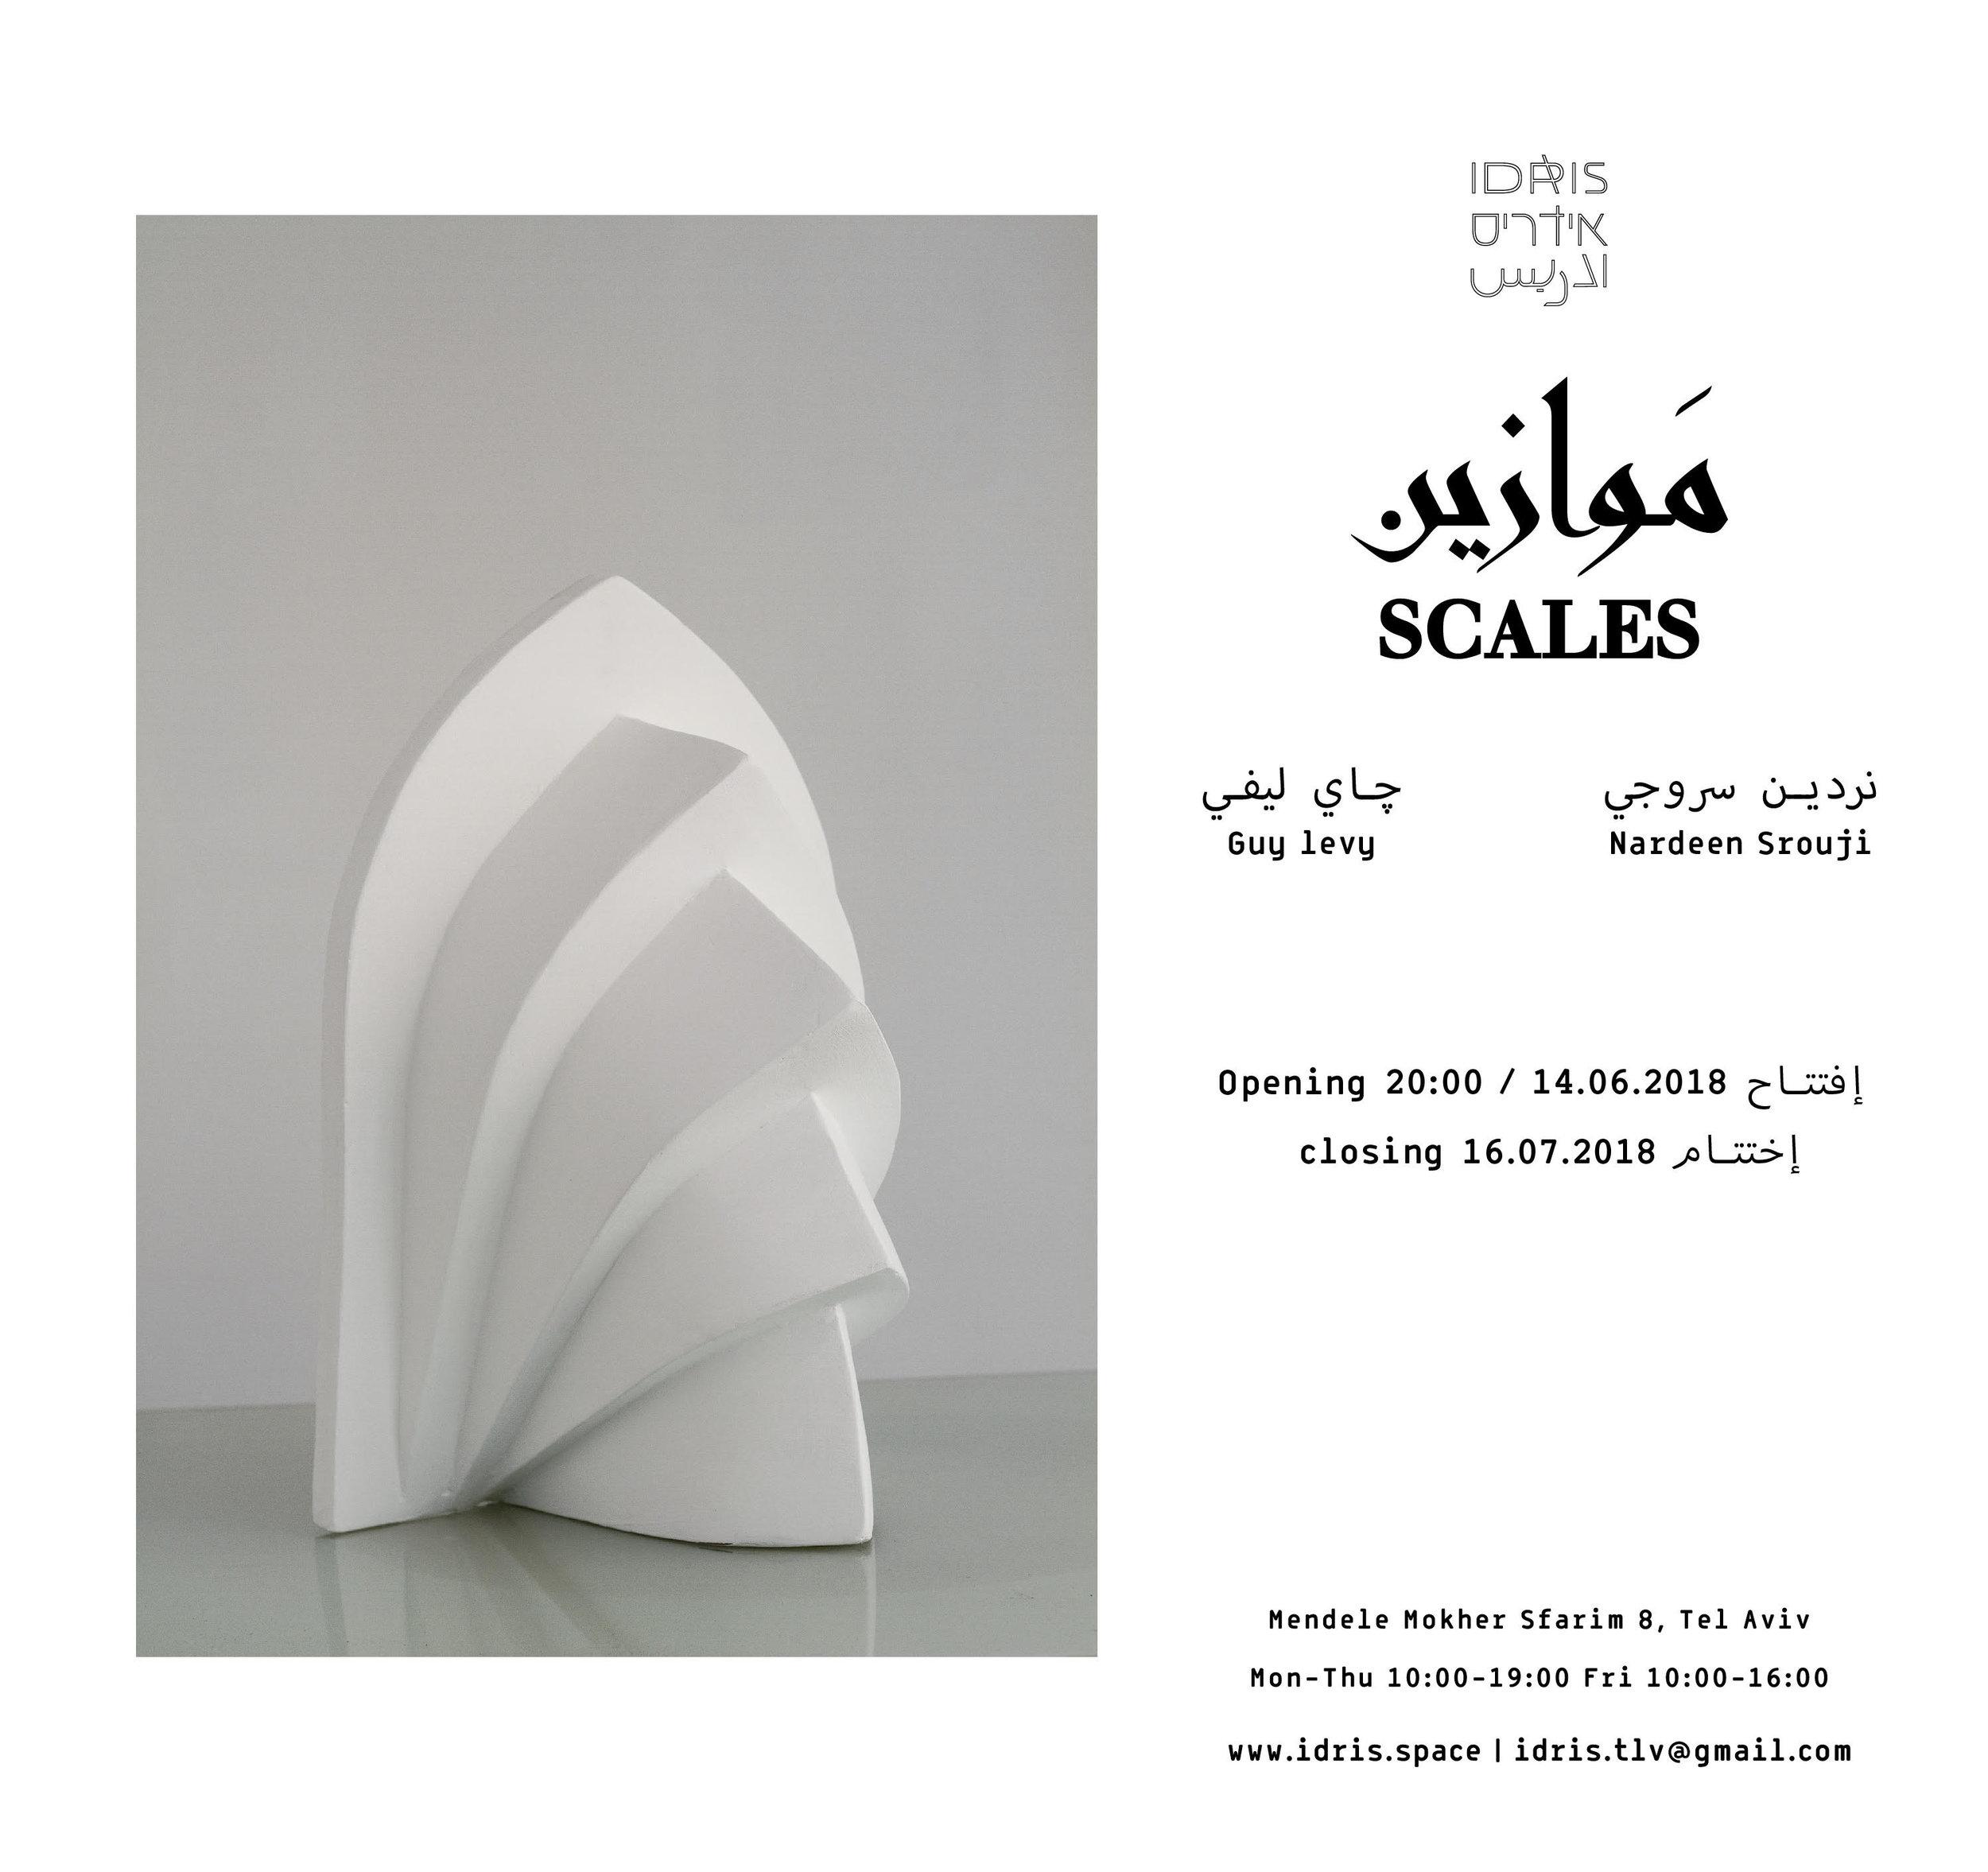 scales invite.jpg